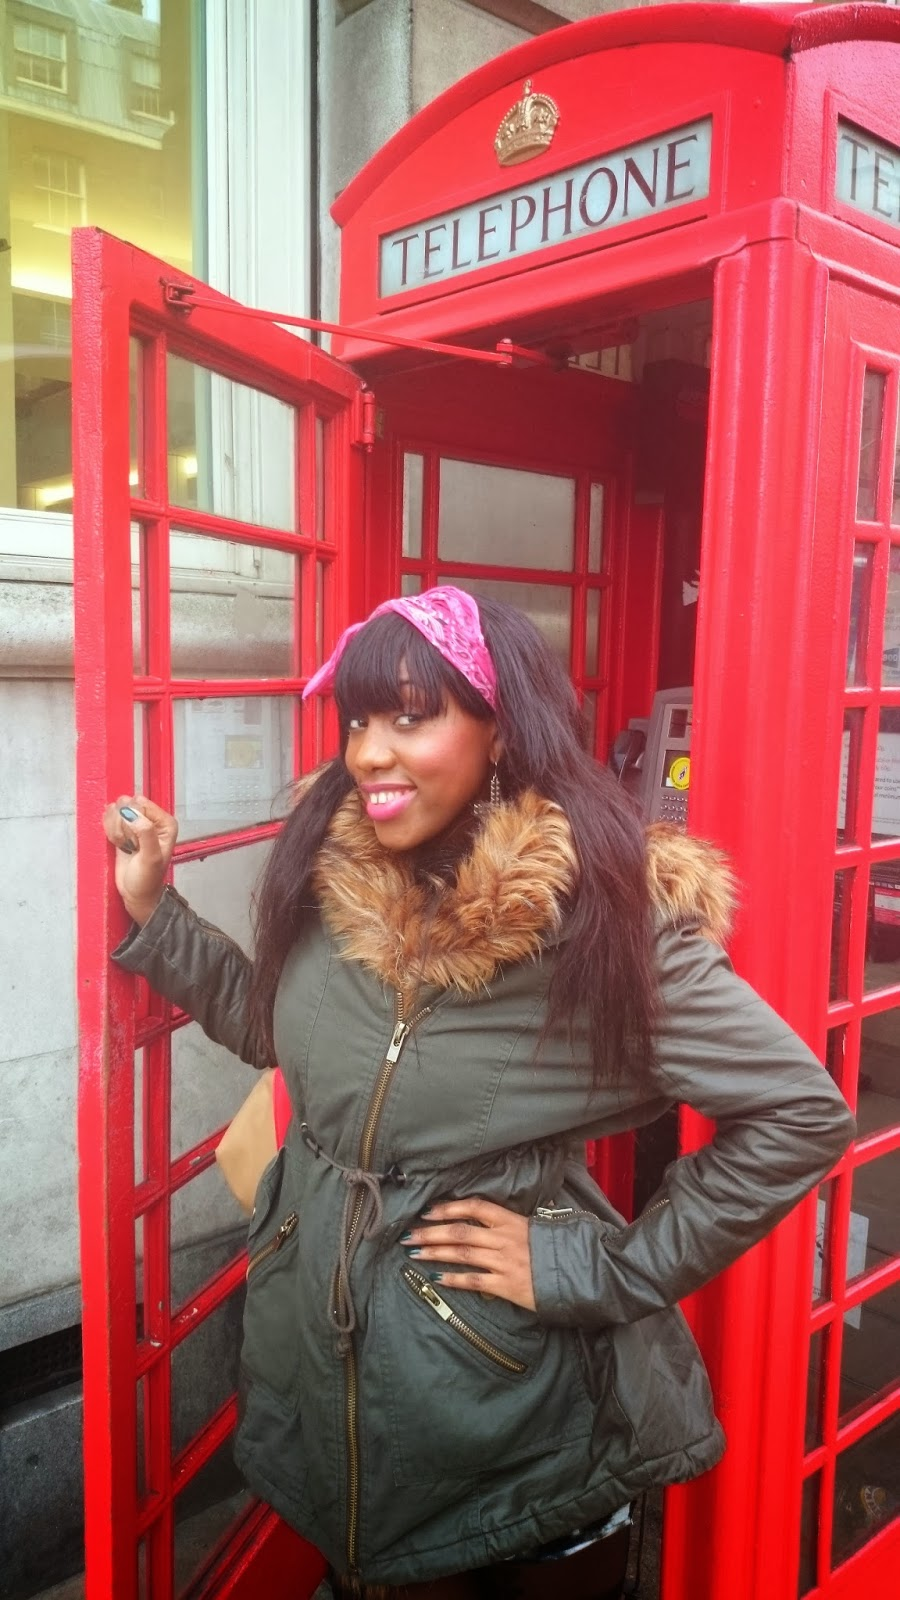 "<img src=""Londonredphonebox.jpg"" alt=""Redphoneboxlondon"" />"